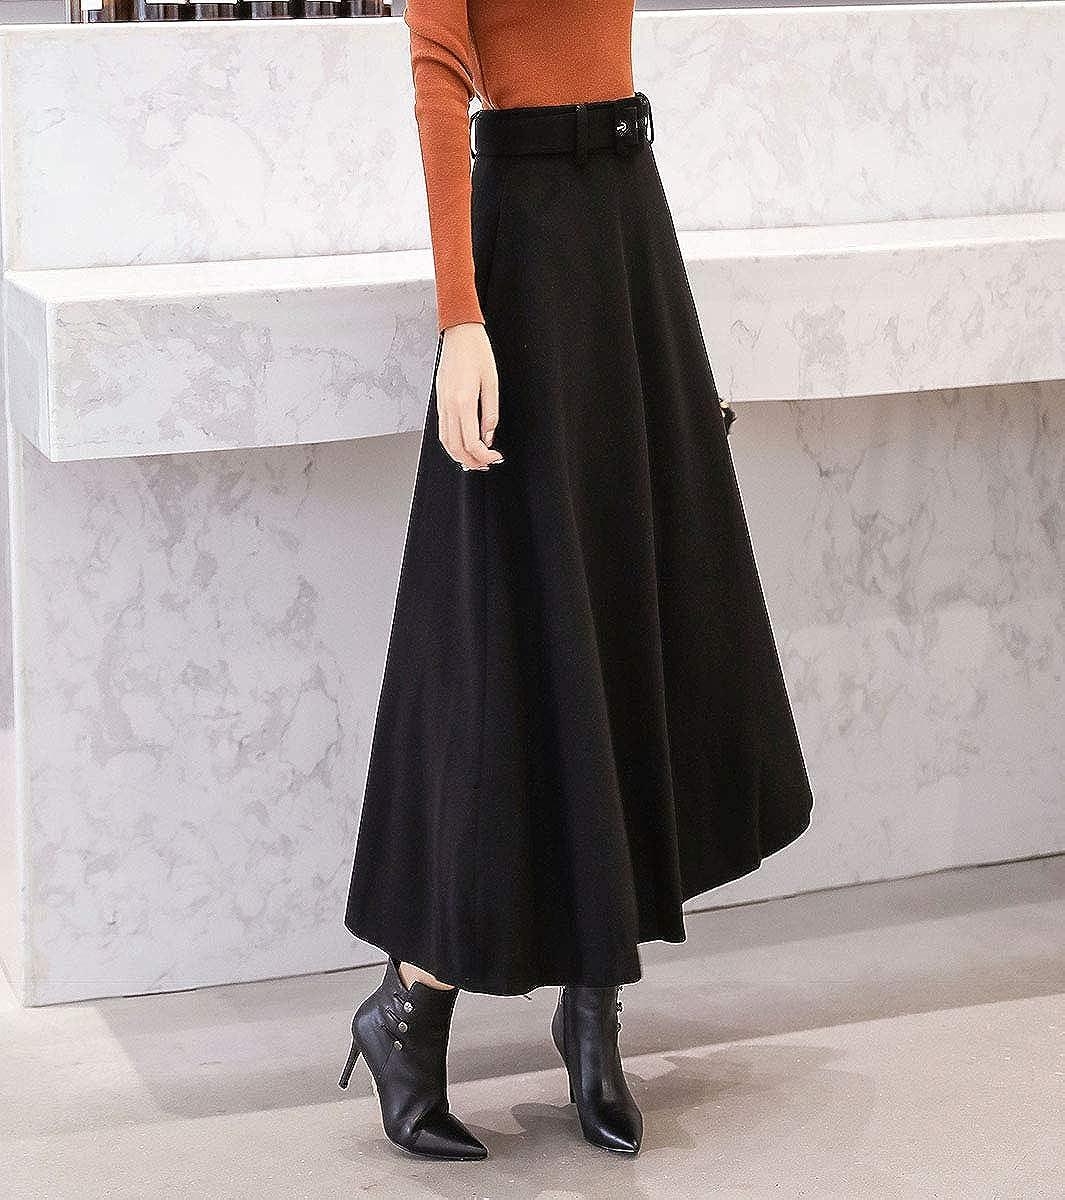 Donna Vintage Elegante Lana Vita Alta Gonne A-Linea Colore Solido Inverno Autunno Caldo Lunga Gonna Cintura